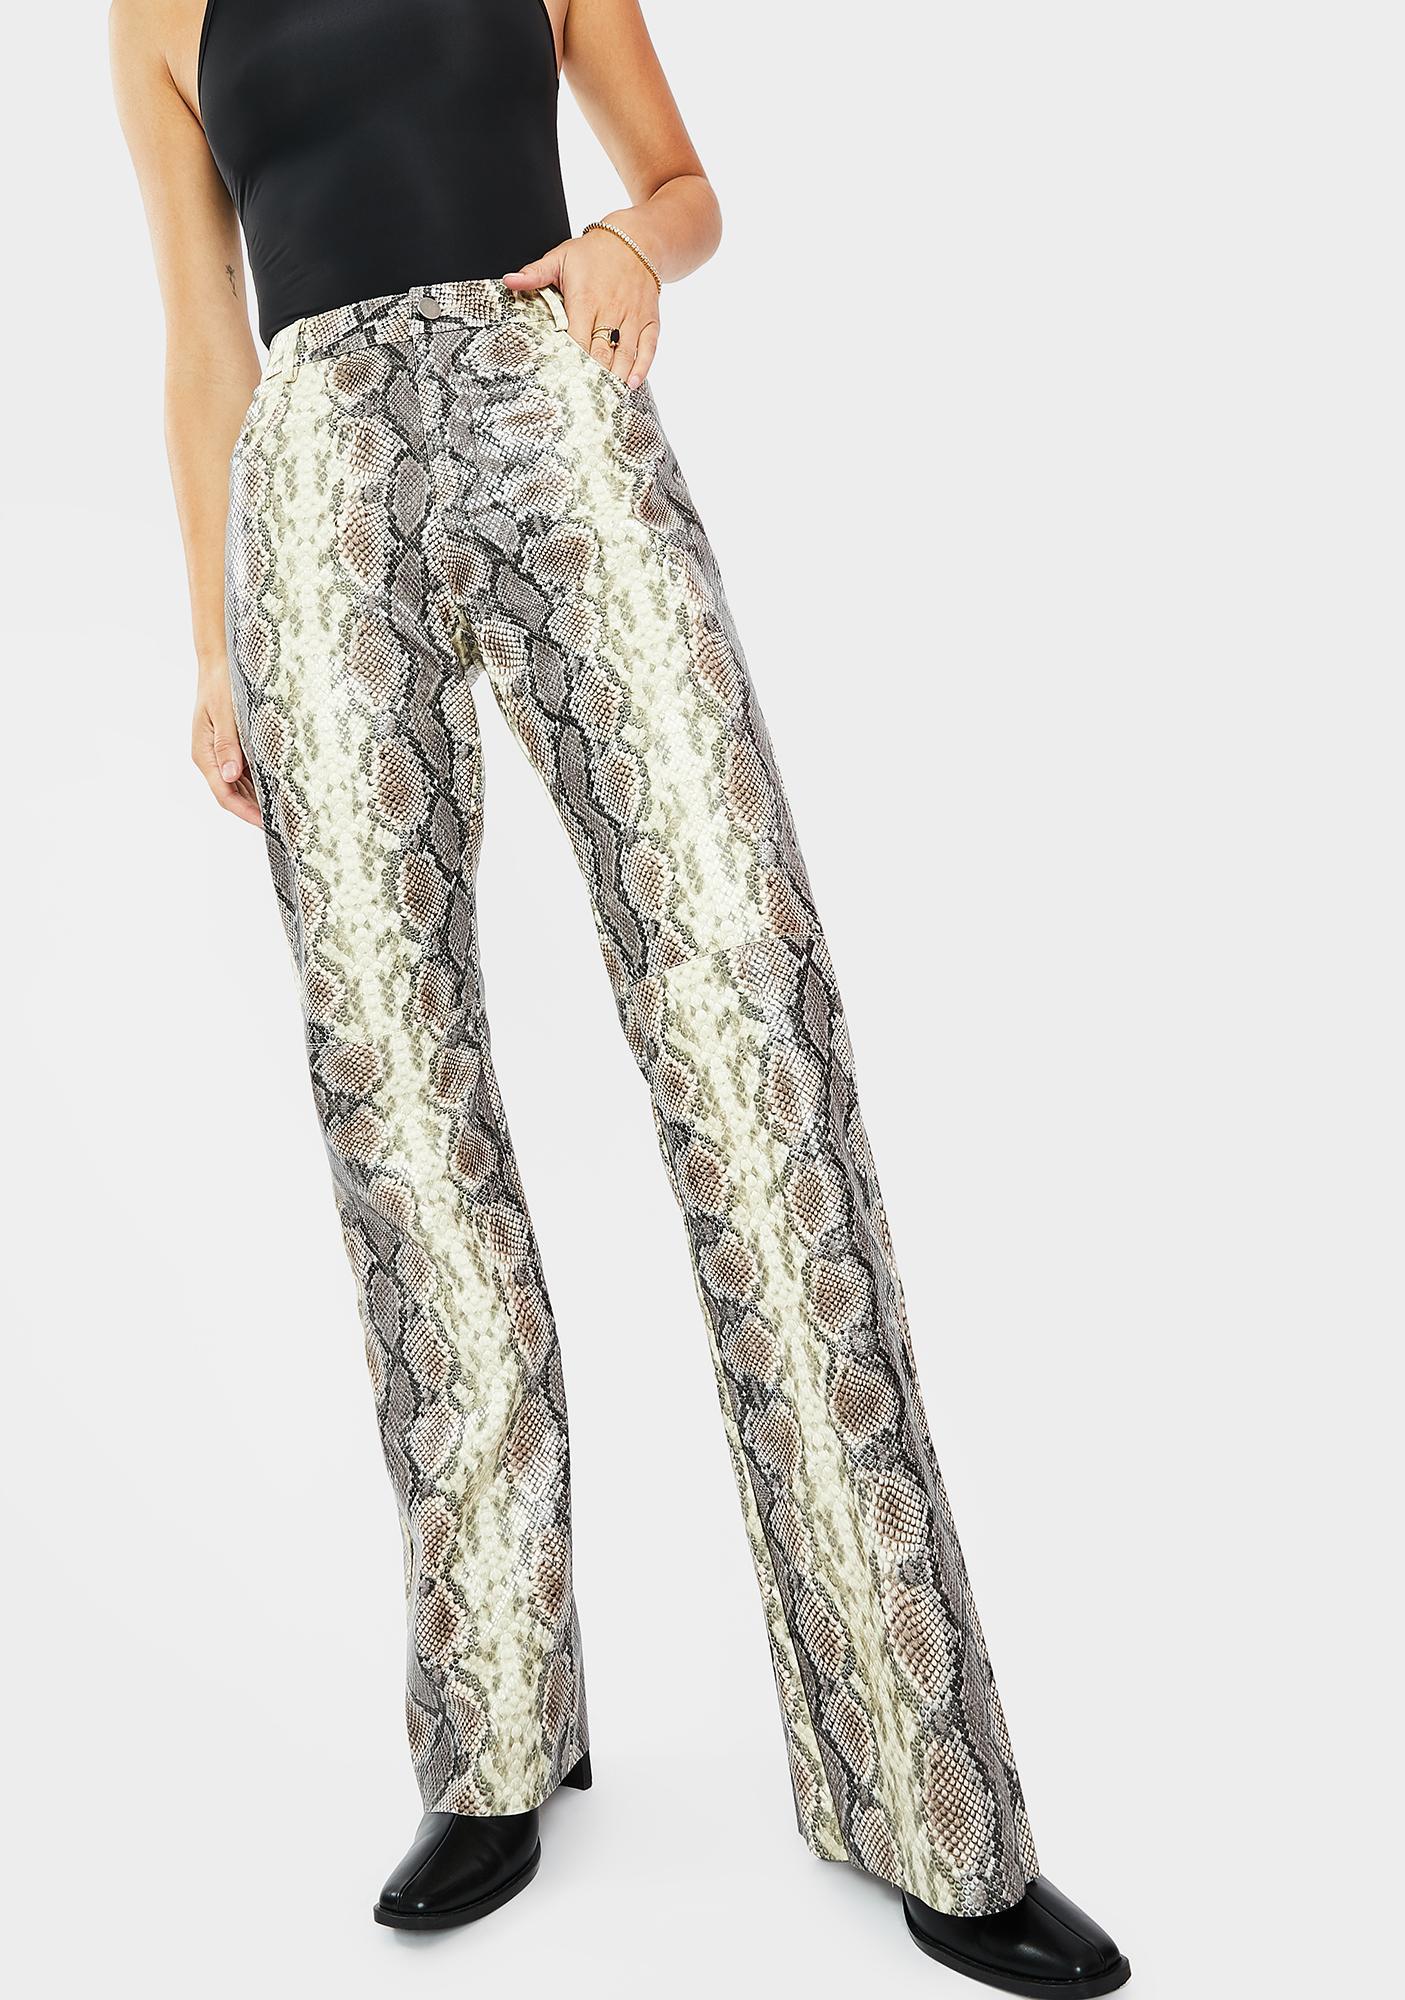 THE KRIPT Kelsey Snakeskin Print Pants